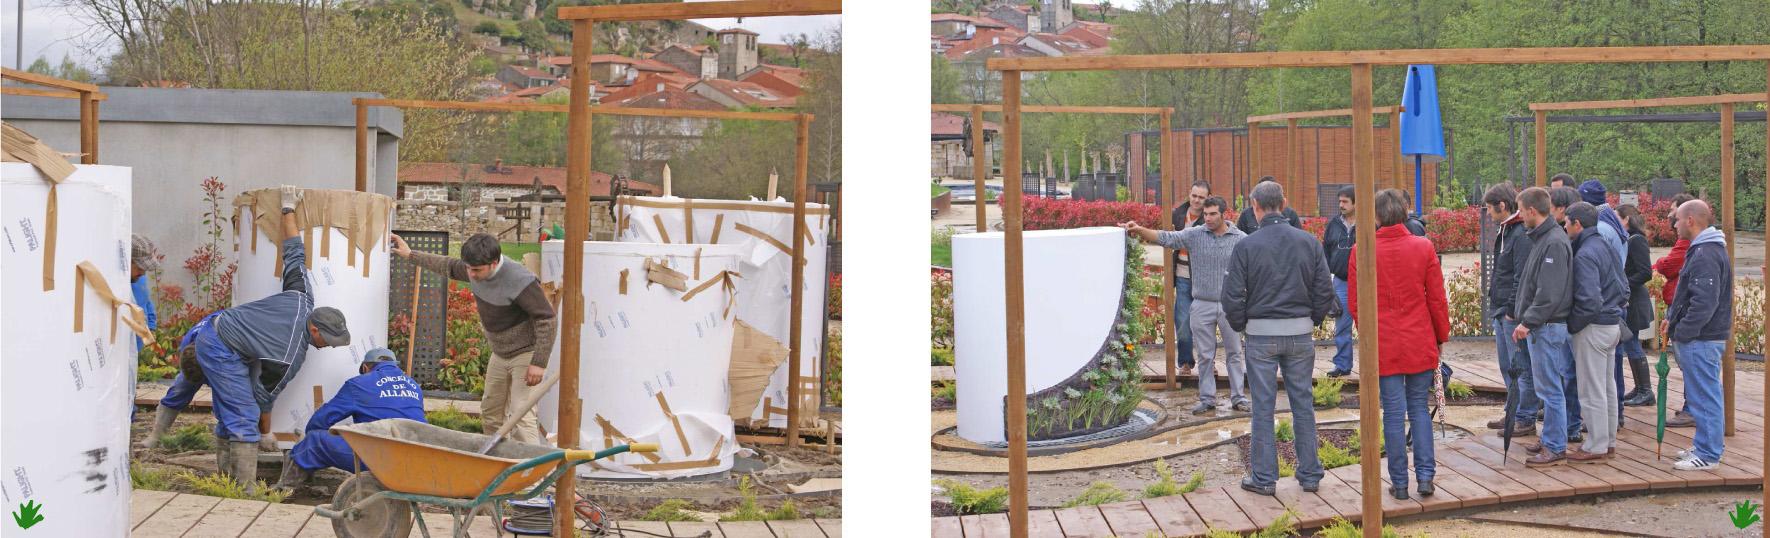 Cursos de jardines verticales paivert paivert for Jardines verticales construccion